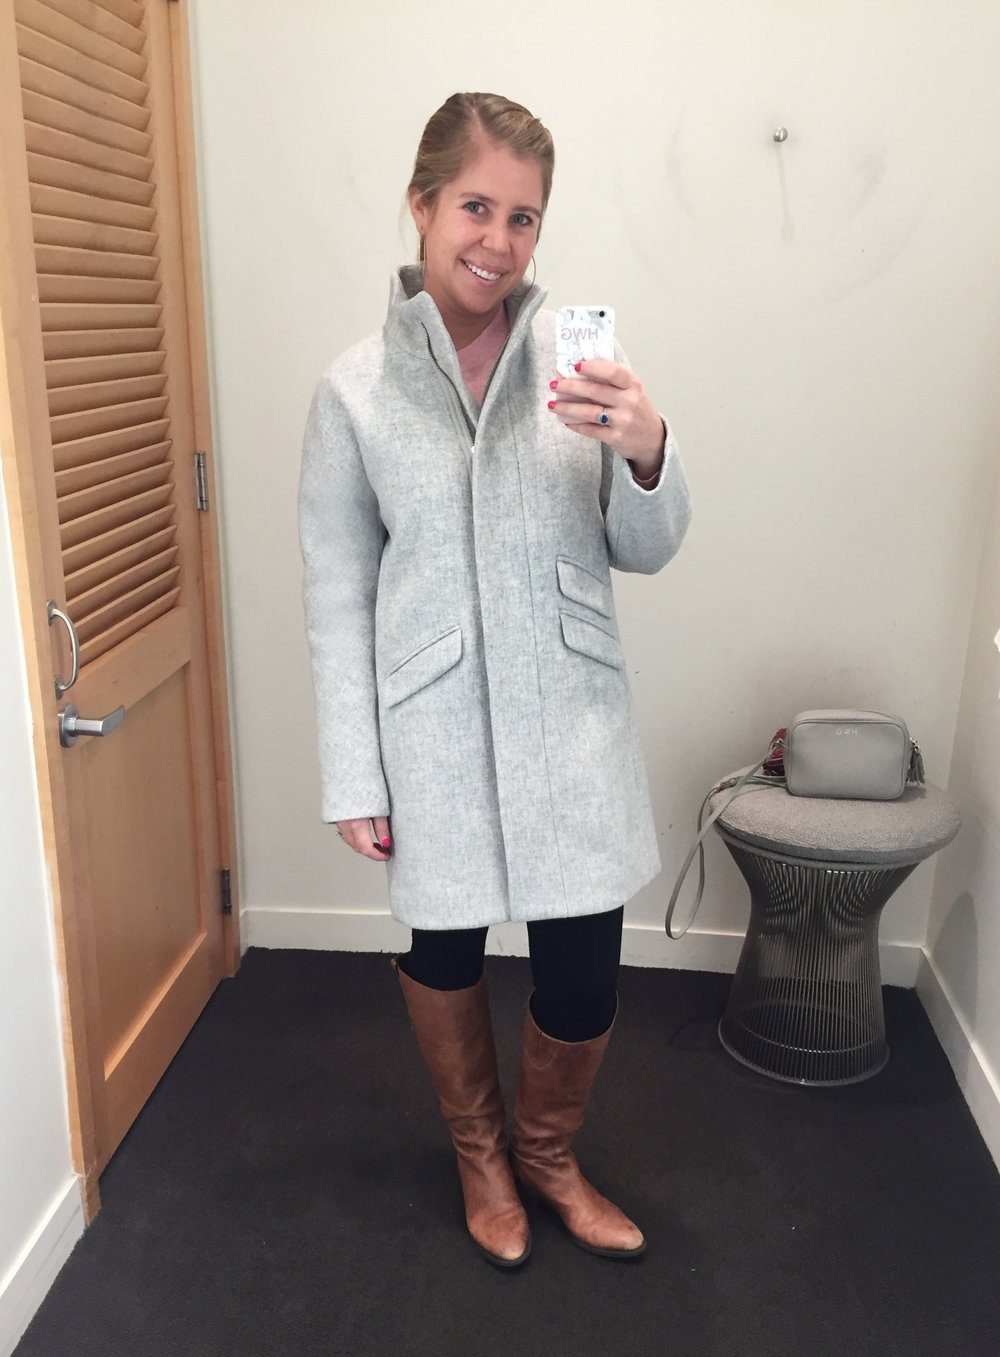 J.Crew Coat I'm Wearing  //  Similar J.Crew Factory Coat  //  Pink Sweater  //  Leggings  //  Boots   //  Crossbody Bag